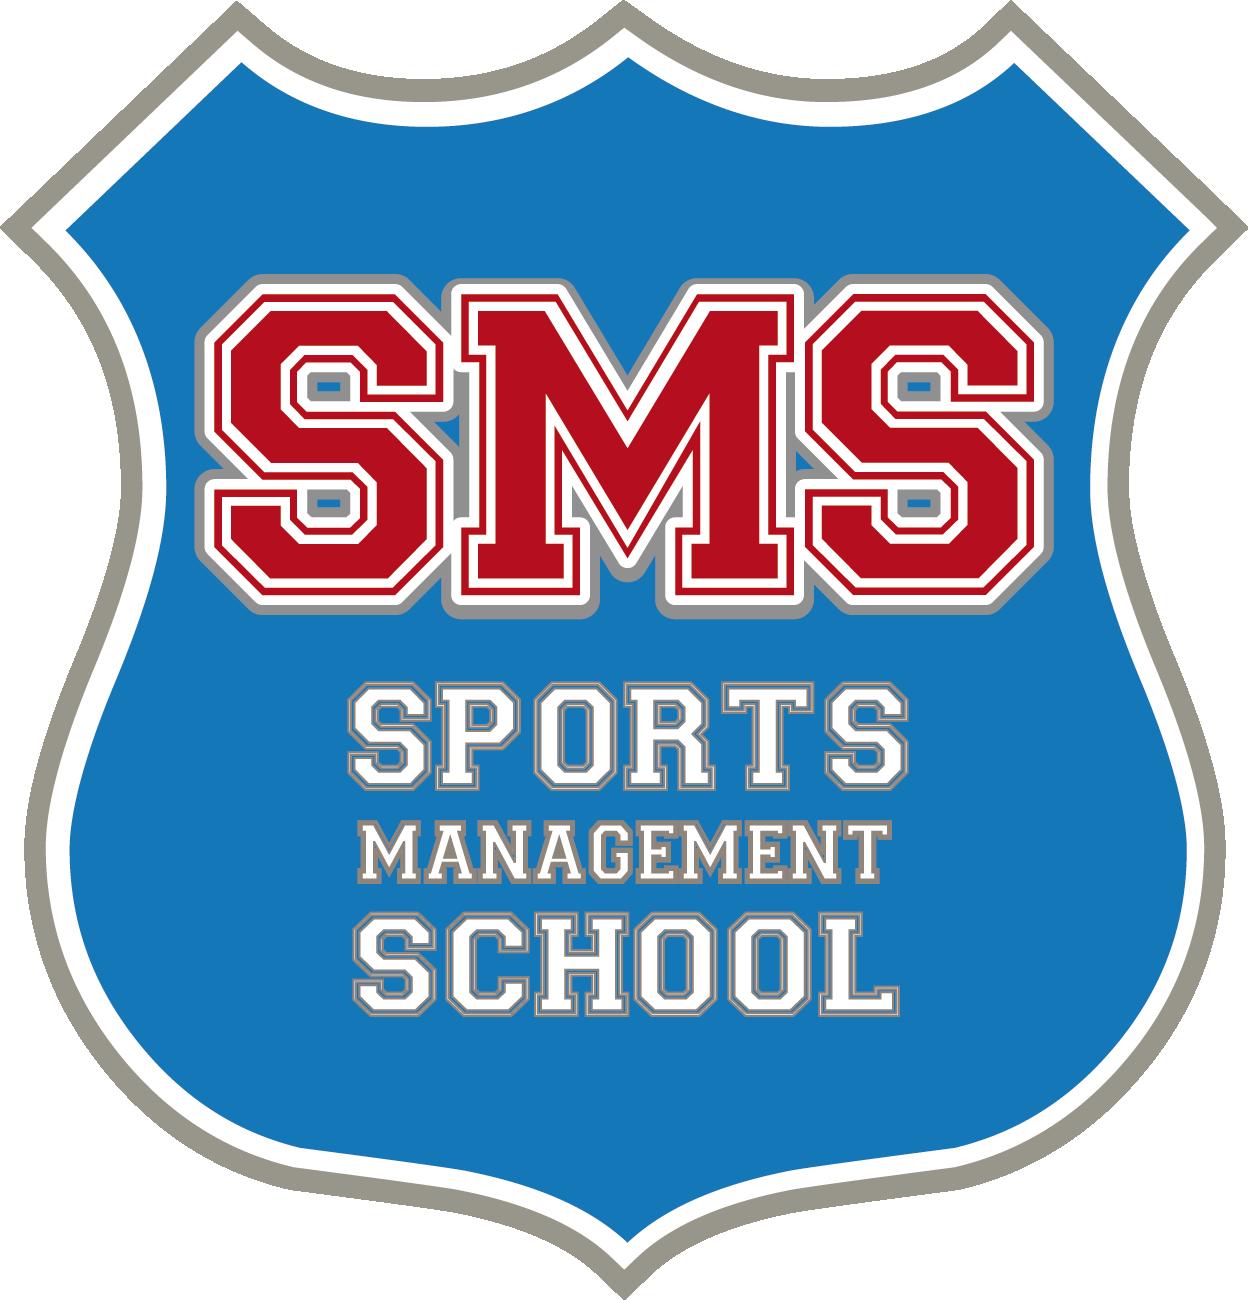 SMS logo sports management school